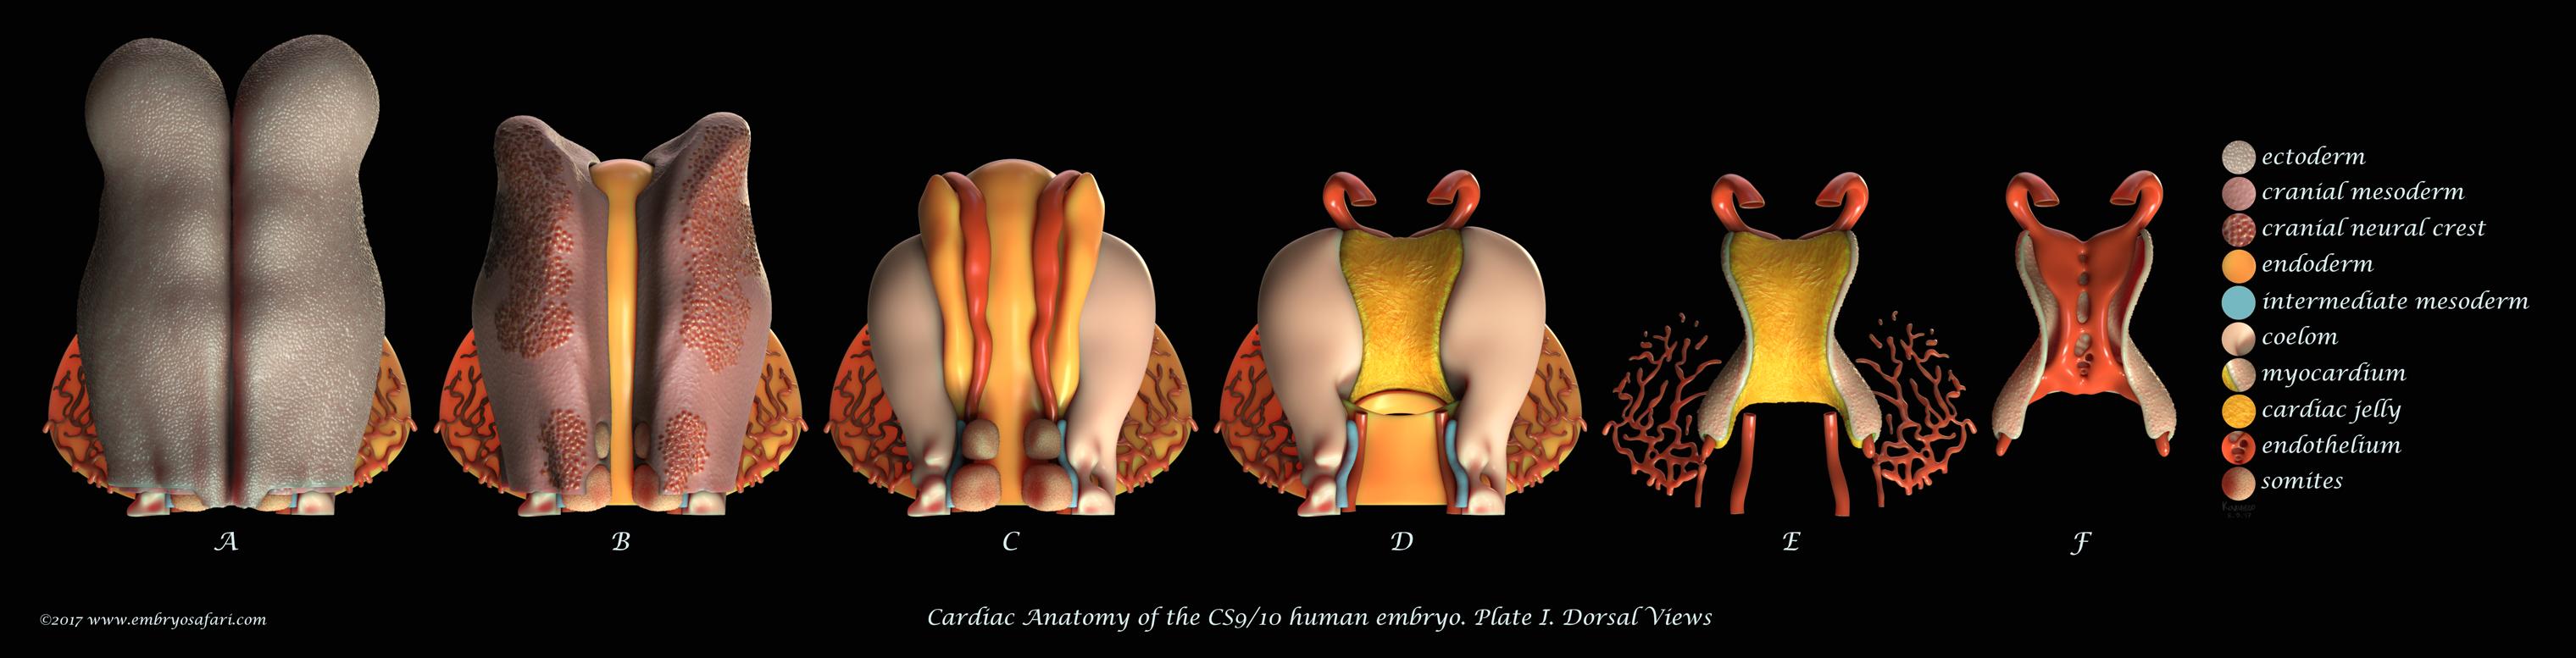 Embryosafari: an attempt at illustrating development - the Node